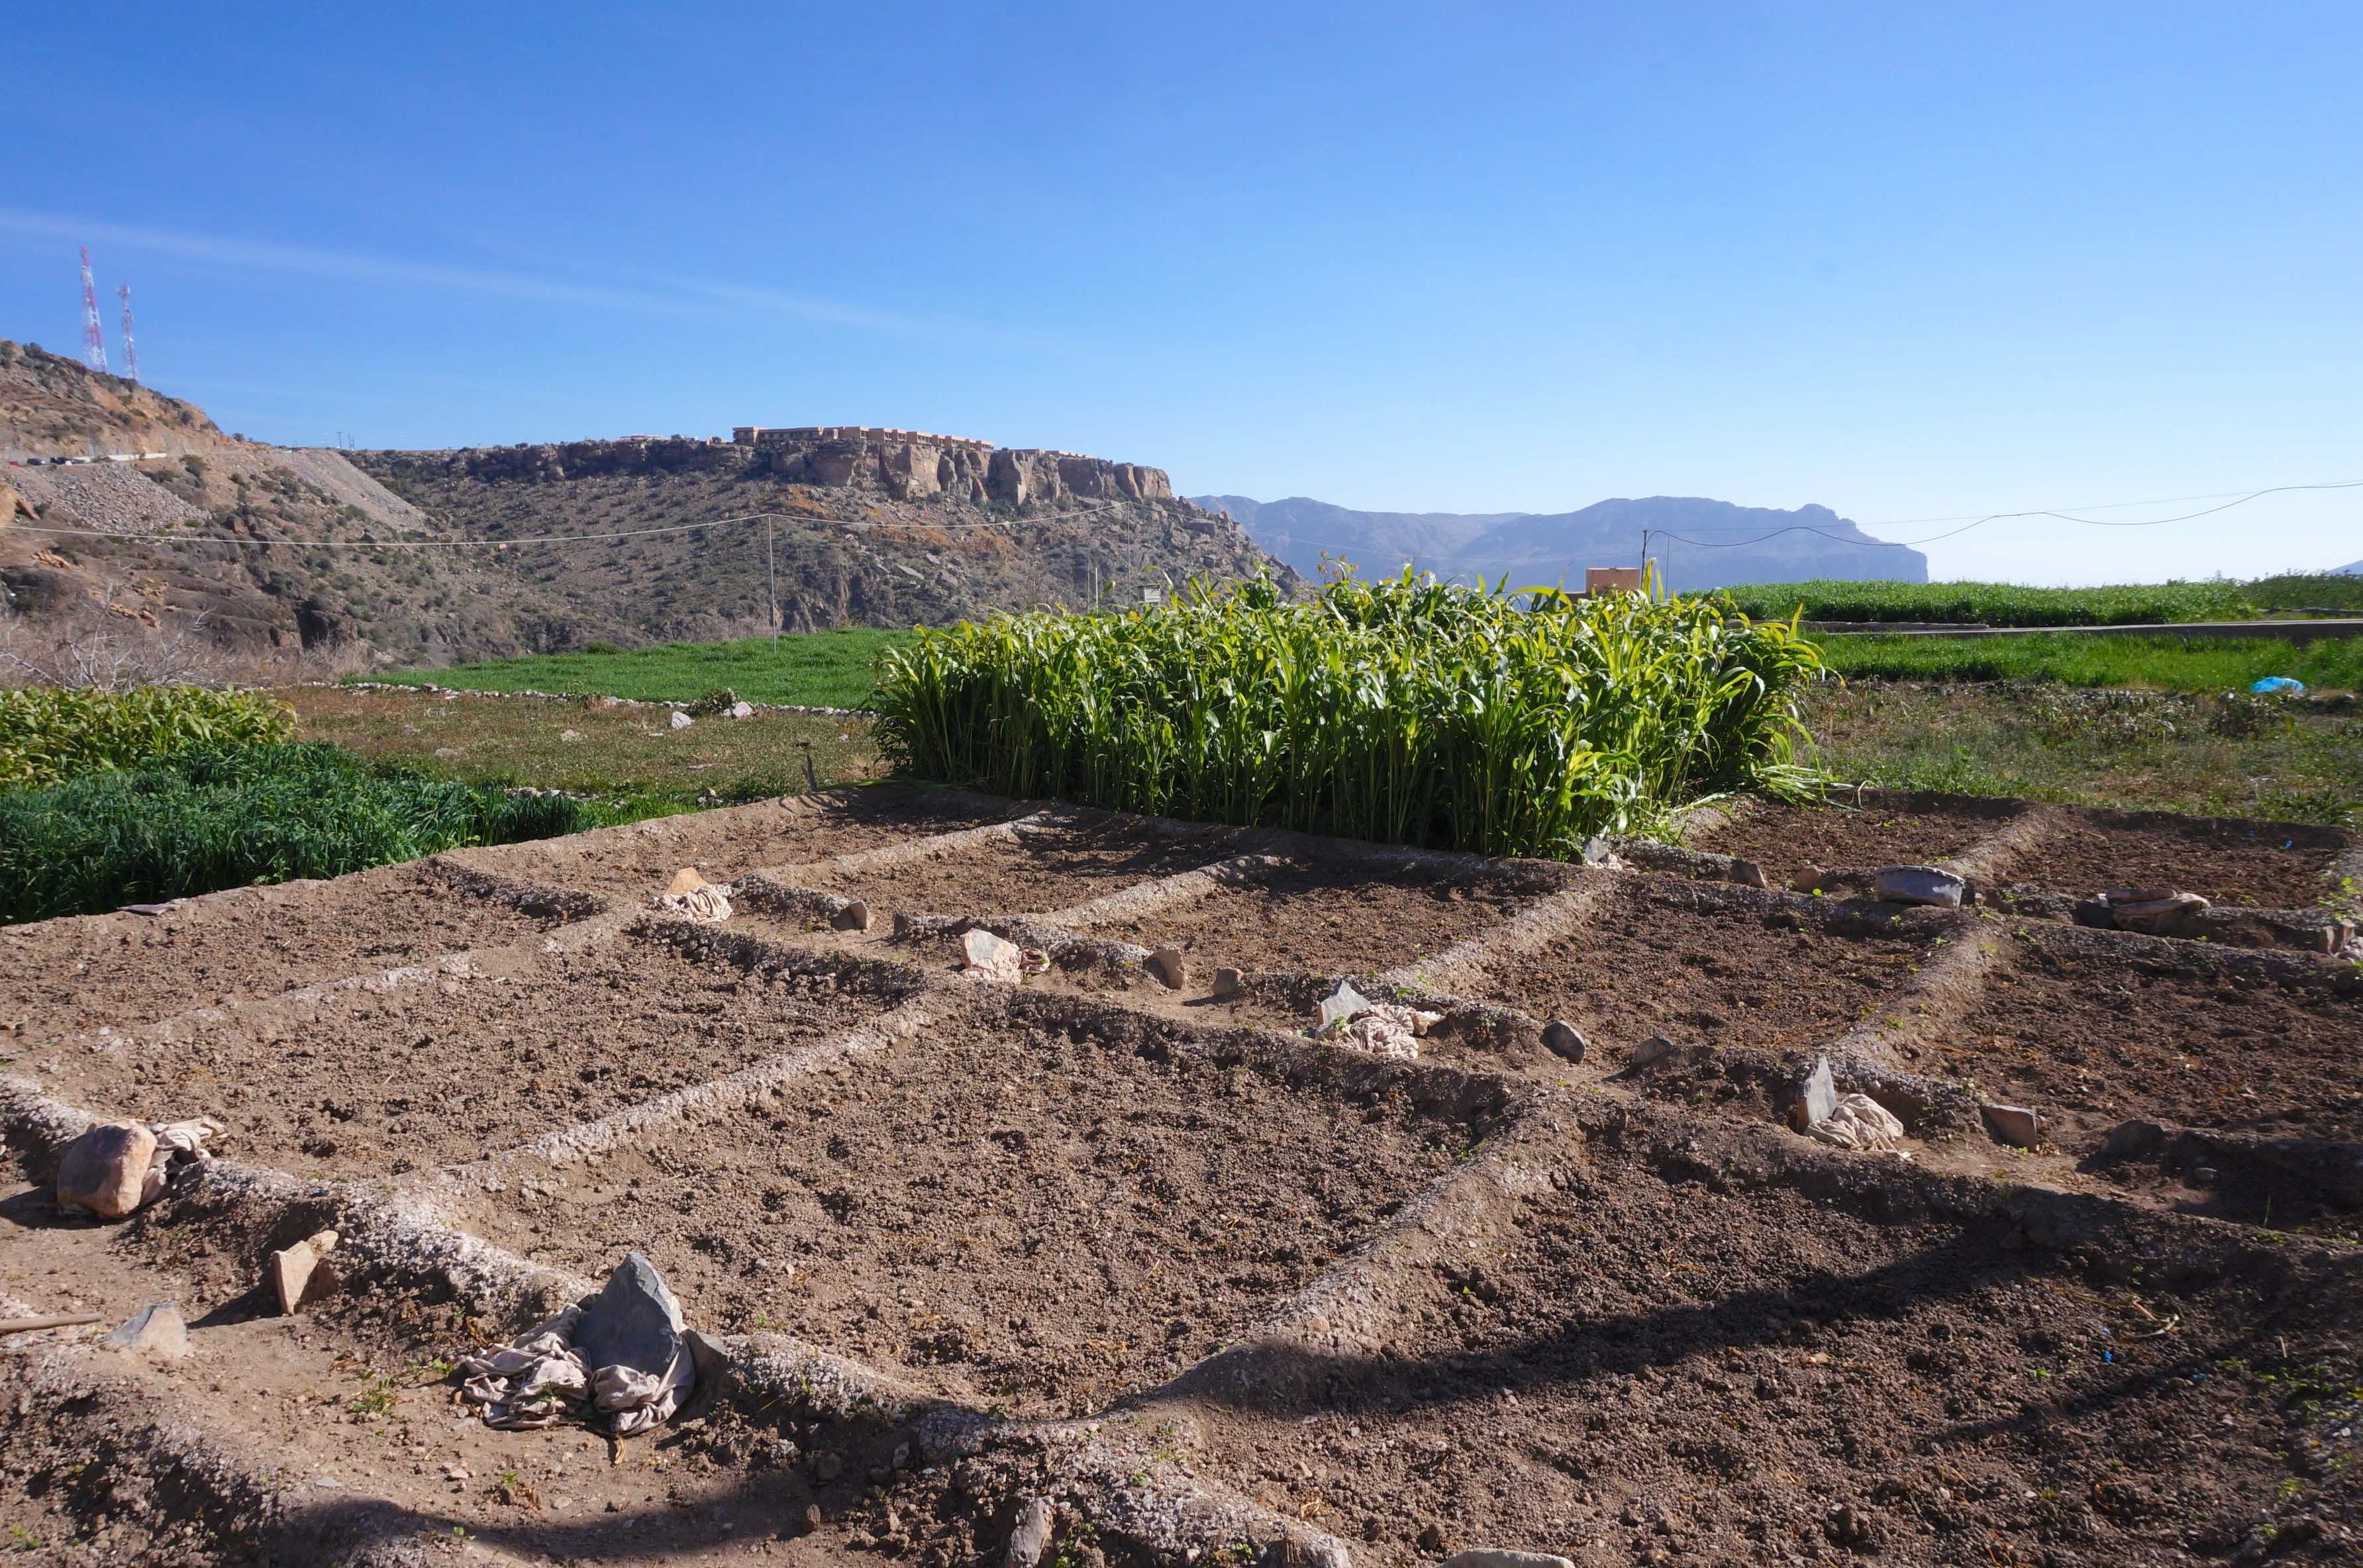 al ayn, plateau de sayq, jebel akdhar, oman